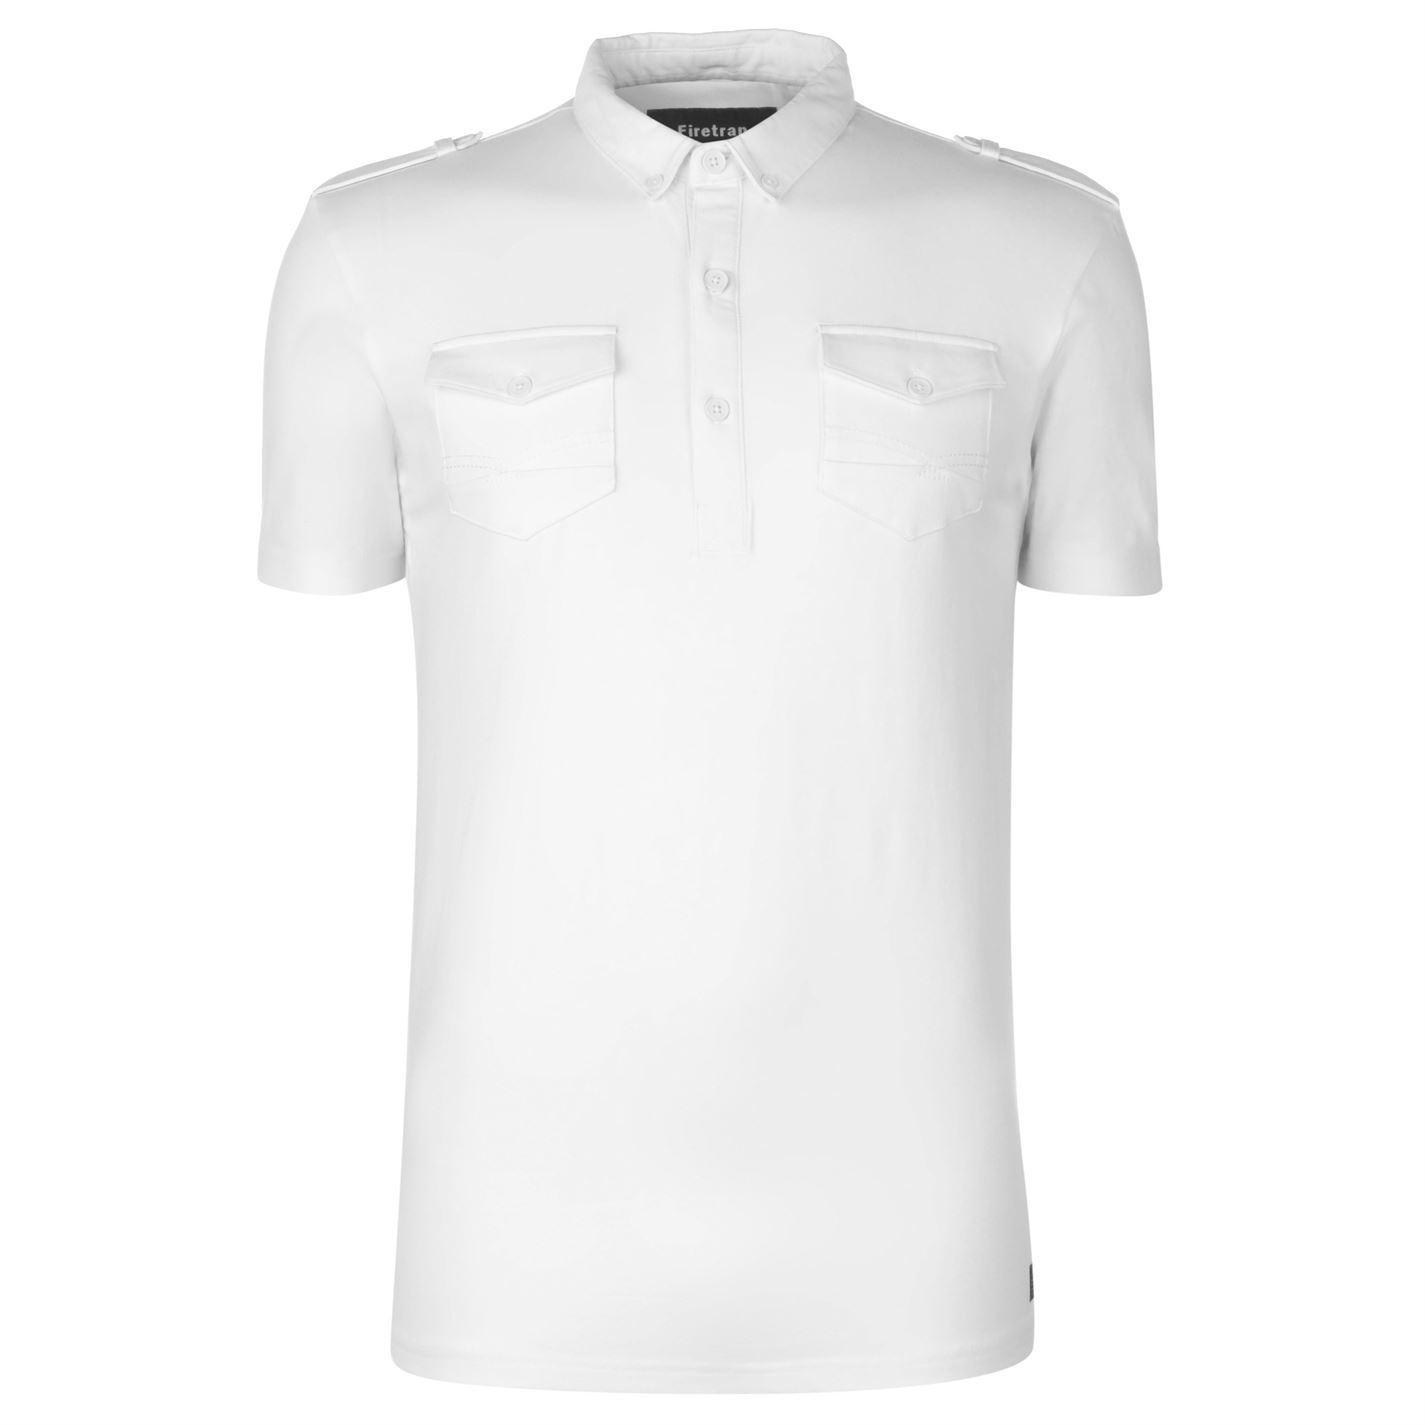 thumbnail 9 - Firetrap-Double-Pocket-Polo-Shirt-Mens-Collar-Top-Tee-Black-Medium